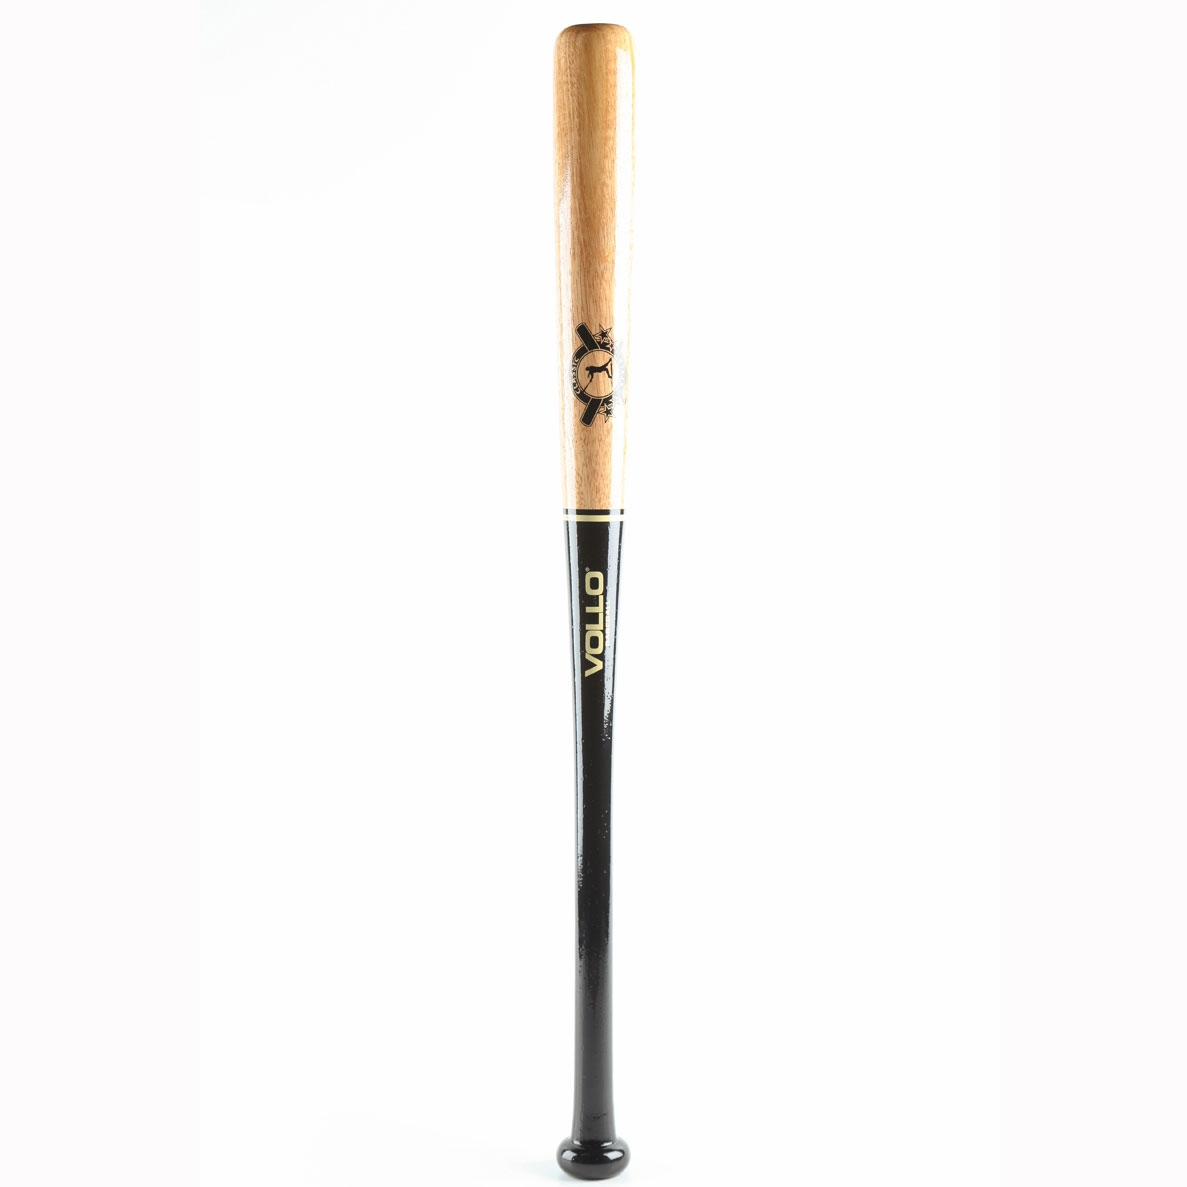 Taco de Baseball Profissional Madeira Vollo - Foto 2